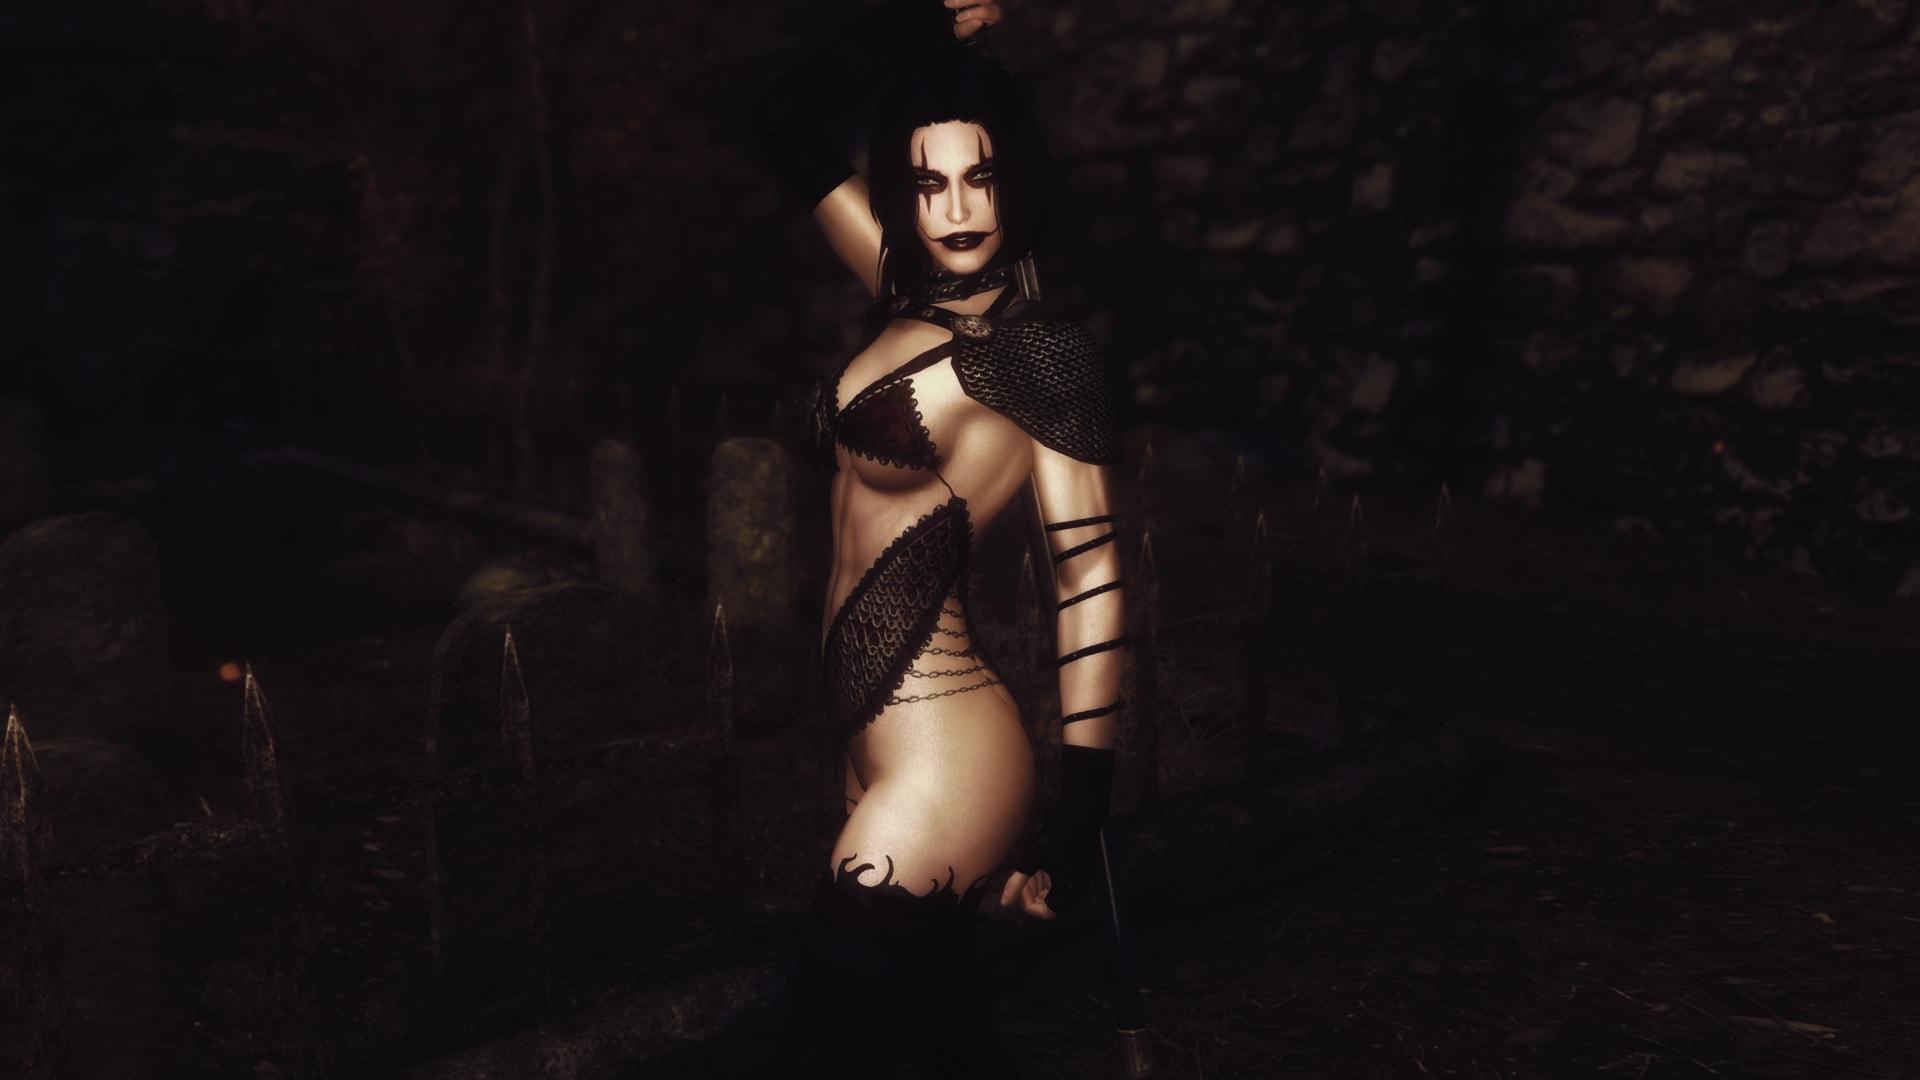 Nerida the Crow - Halloween Follower